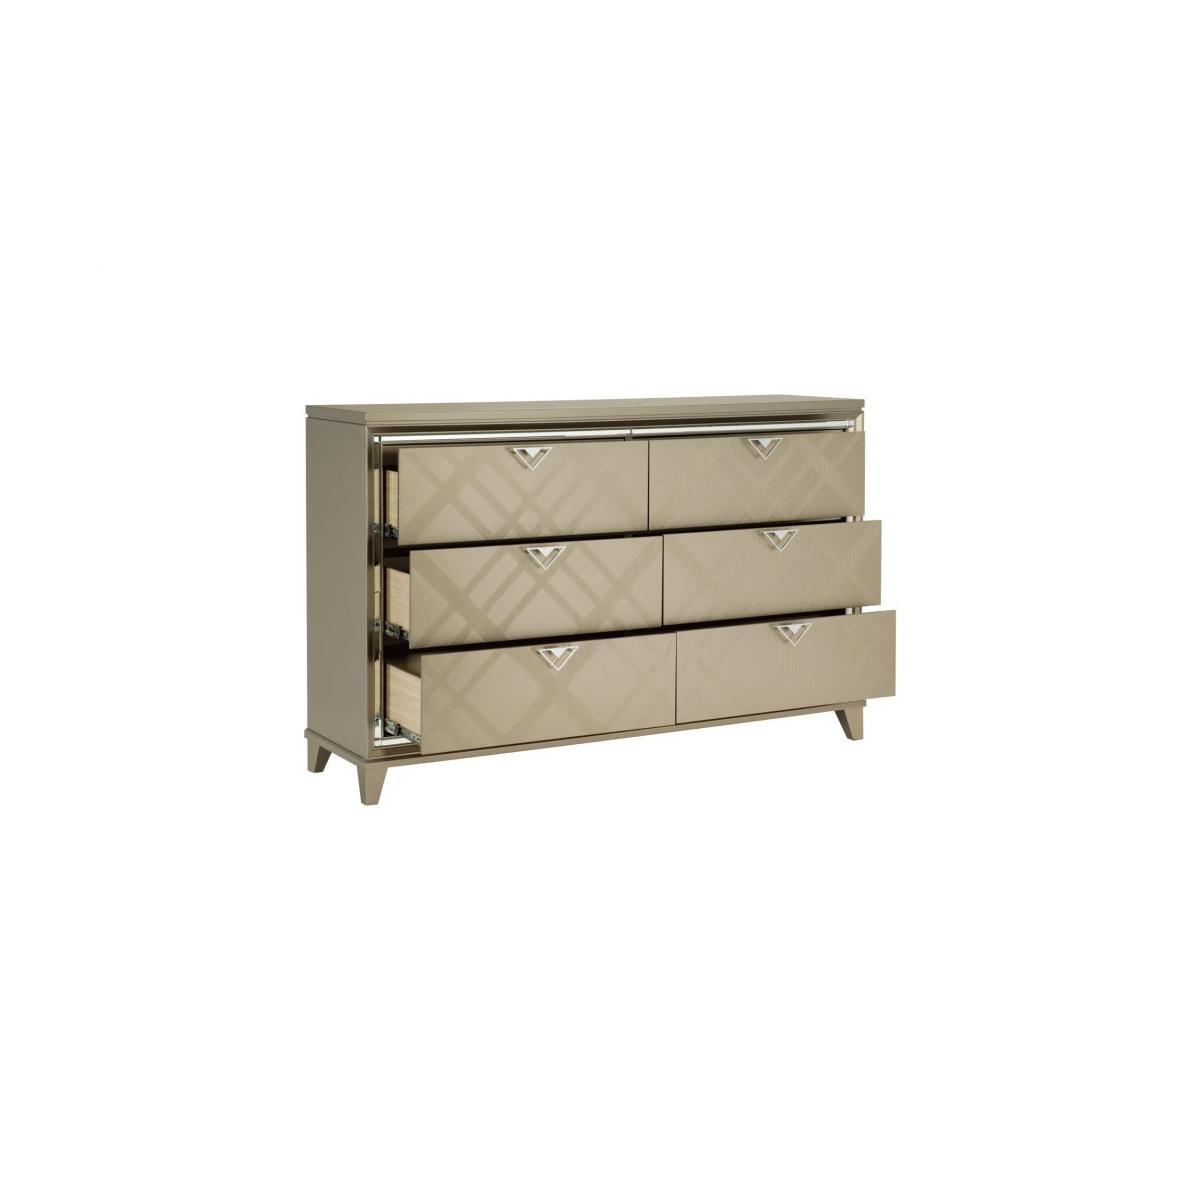 Dresser with Hidden Jewelry Drawers